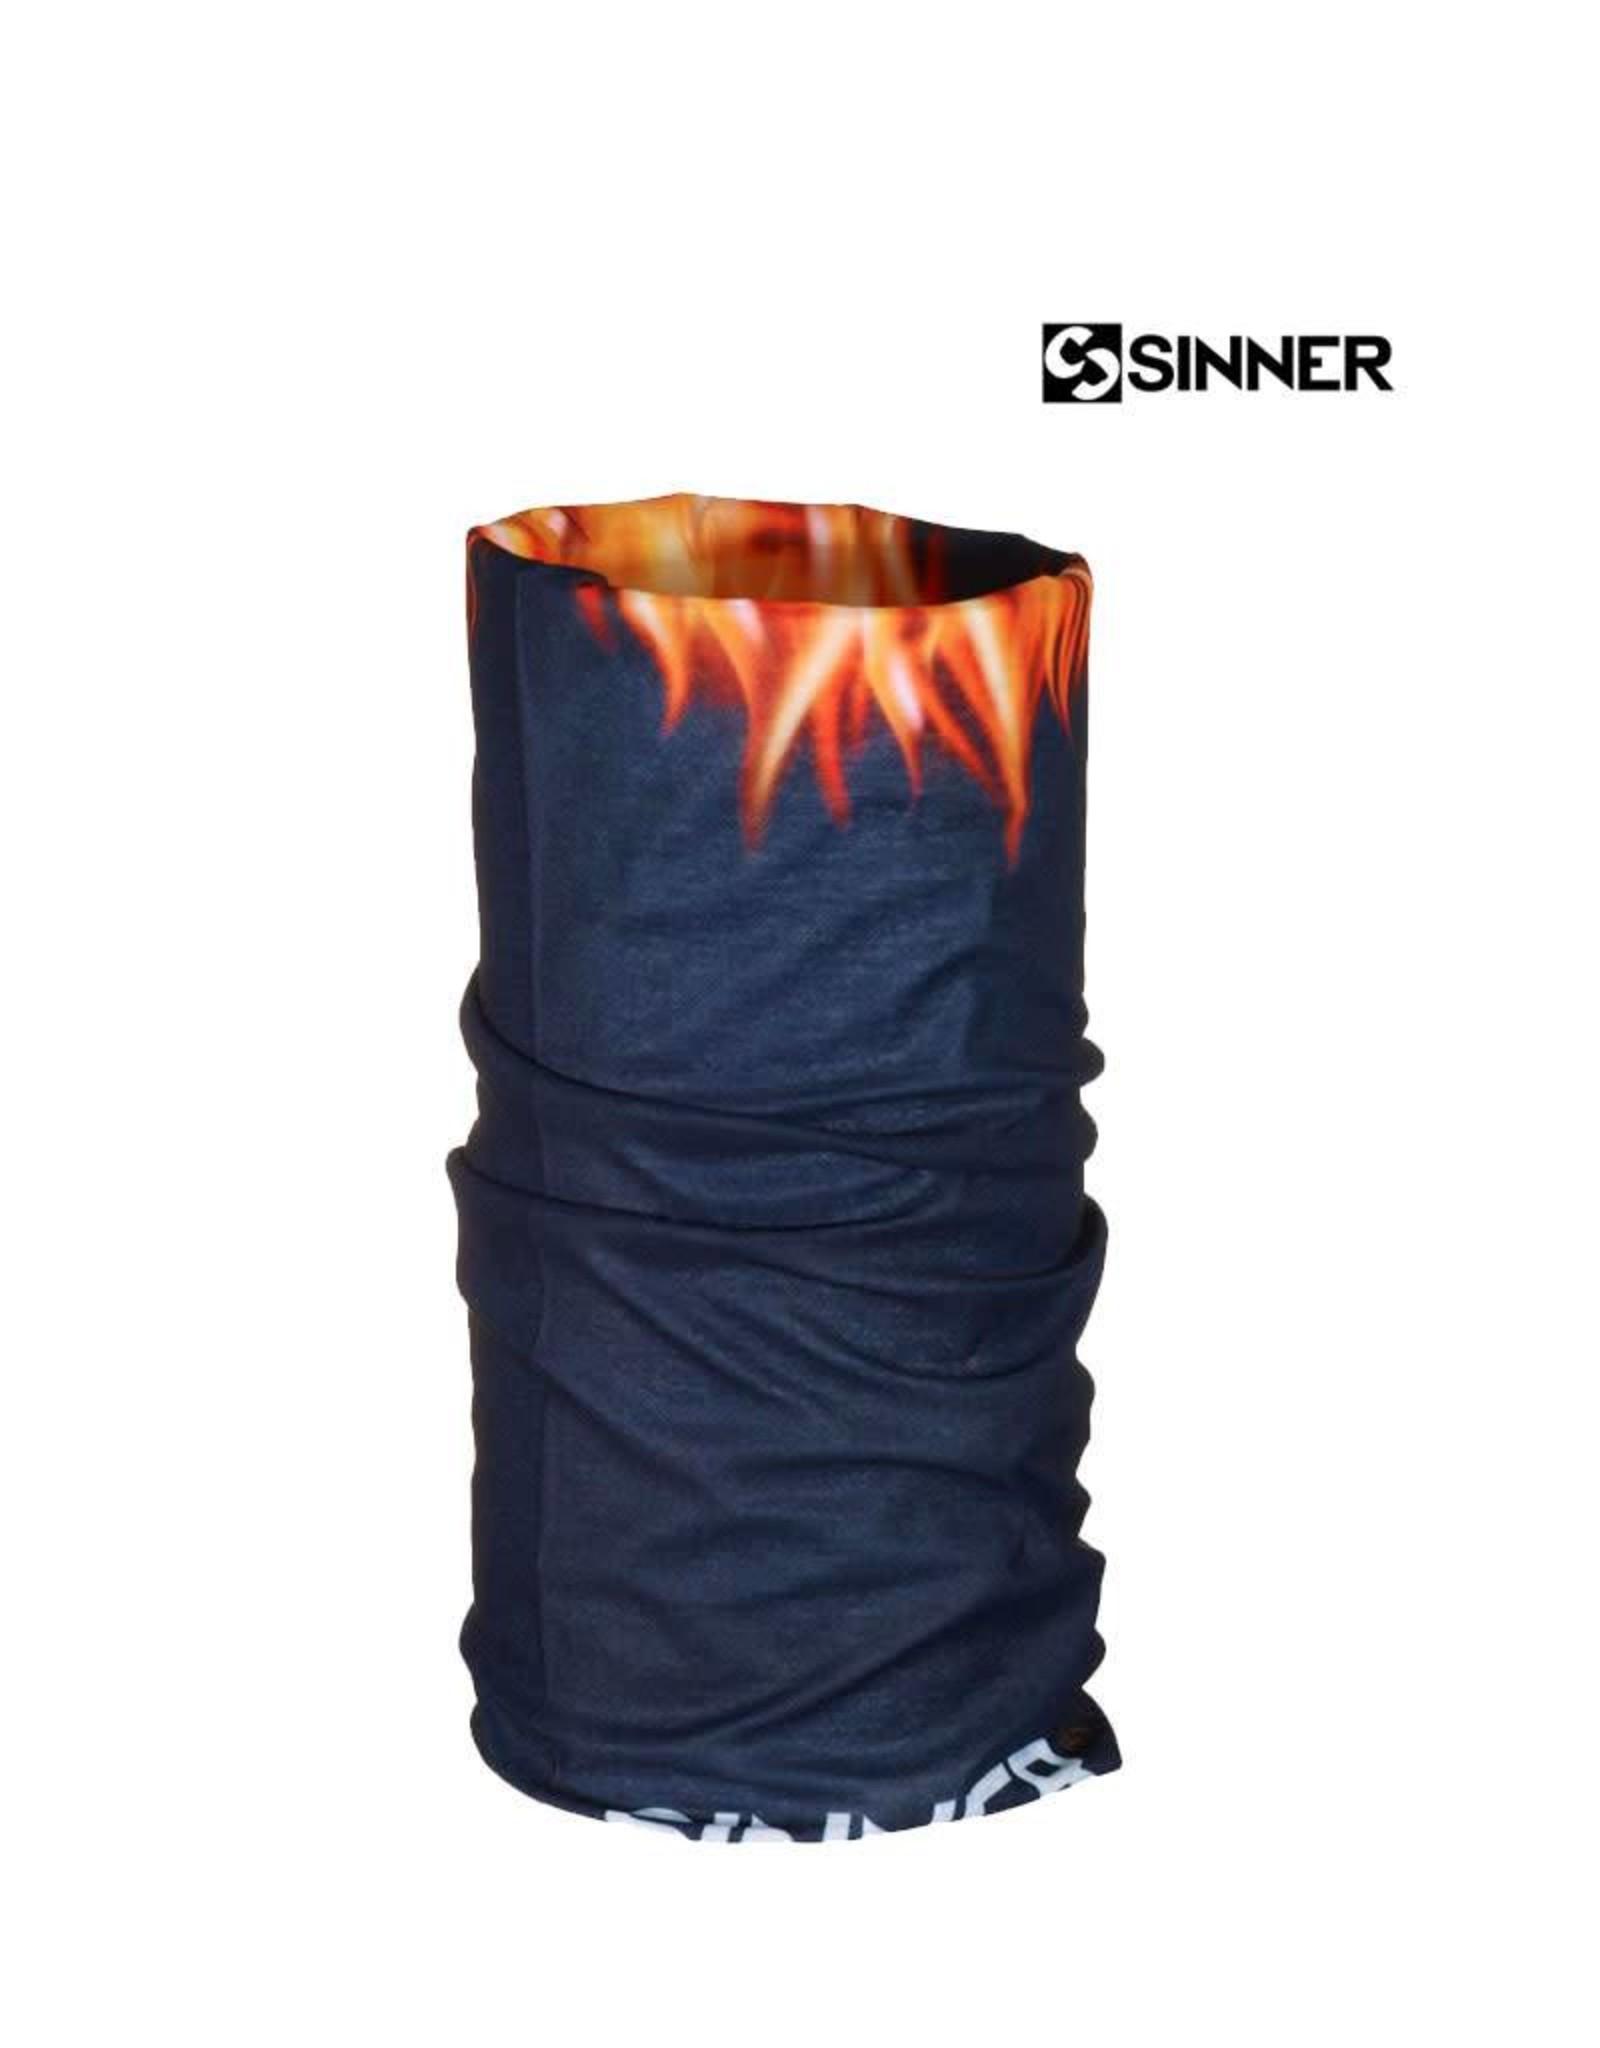 SINNER SINNER BANDANA FLAME